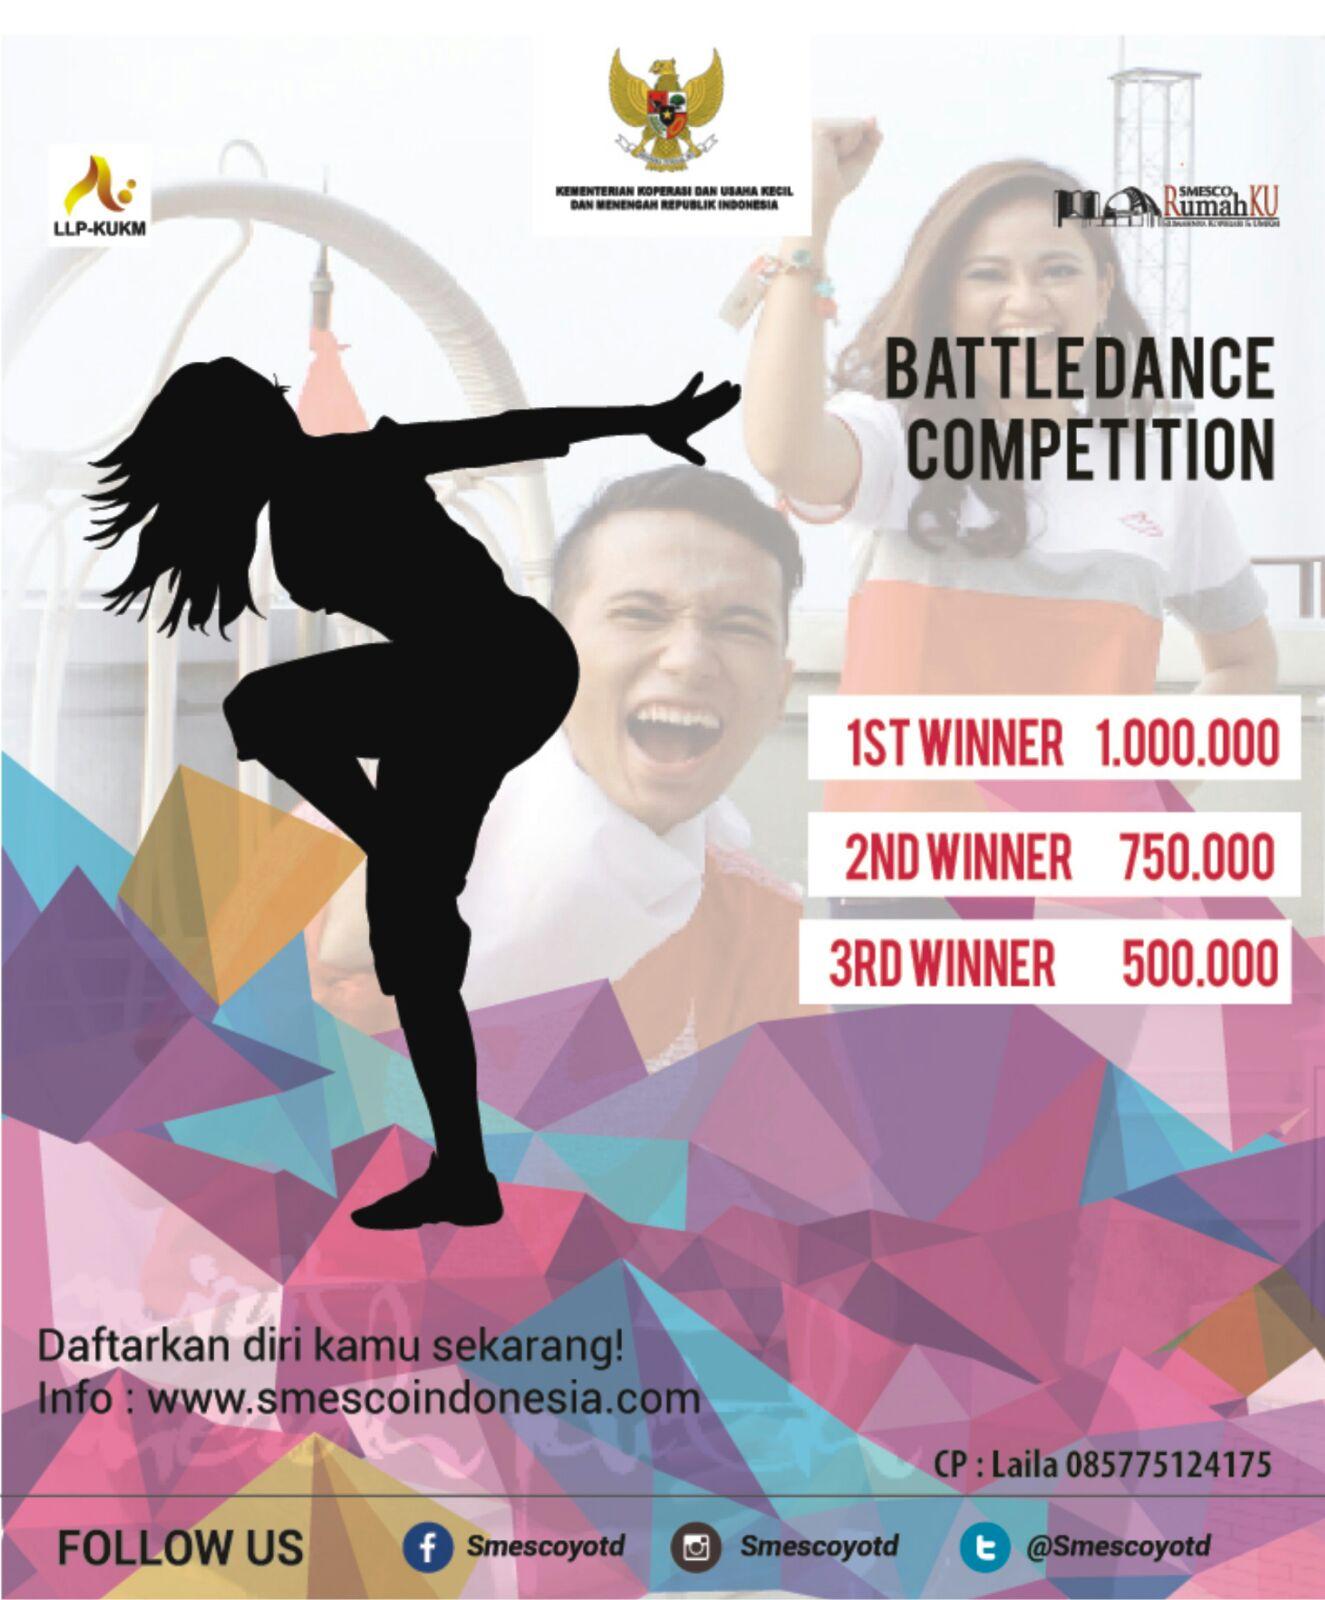 October 2015 Smesco Promo Produk Ukm Bumn Kain Batik Handmade Warna Alam Battle Dance Competition